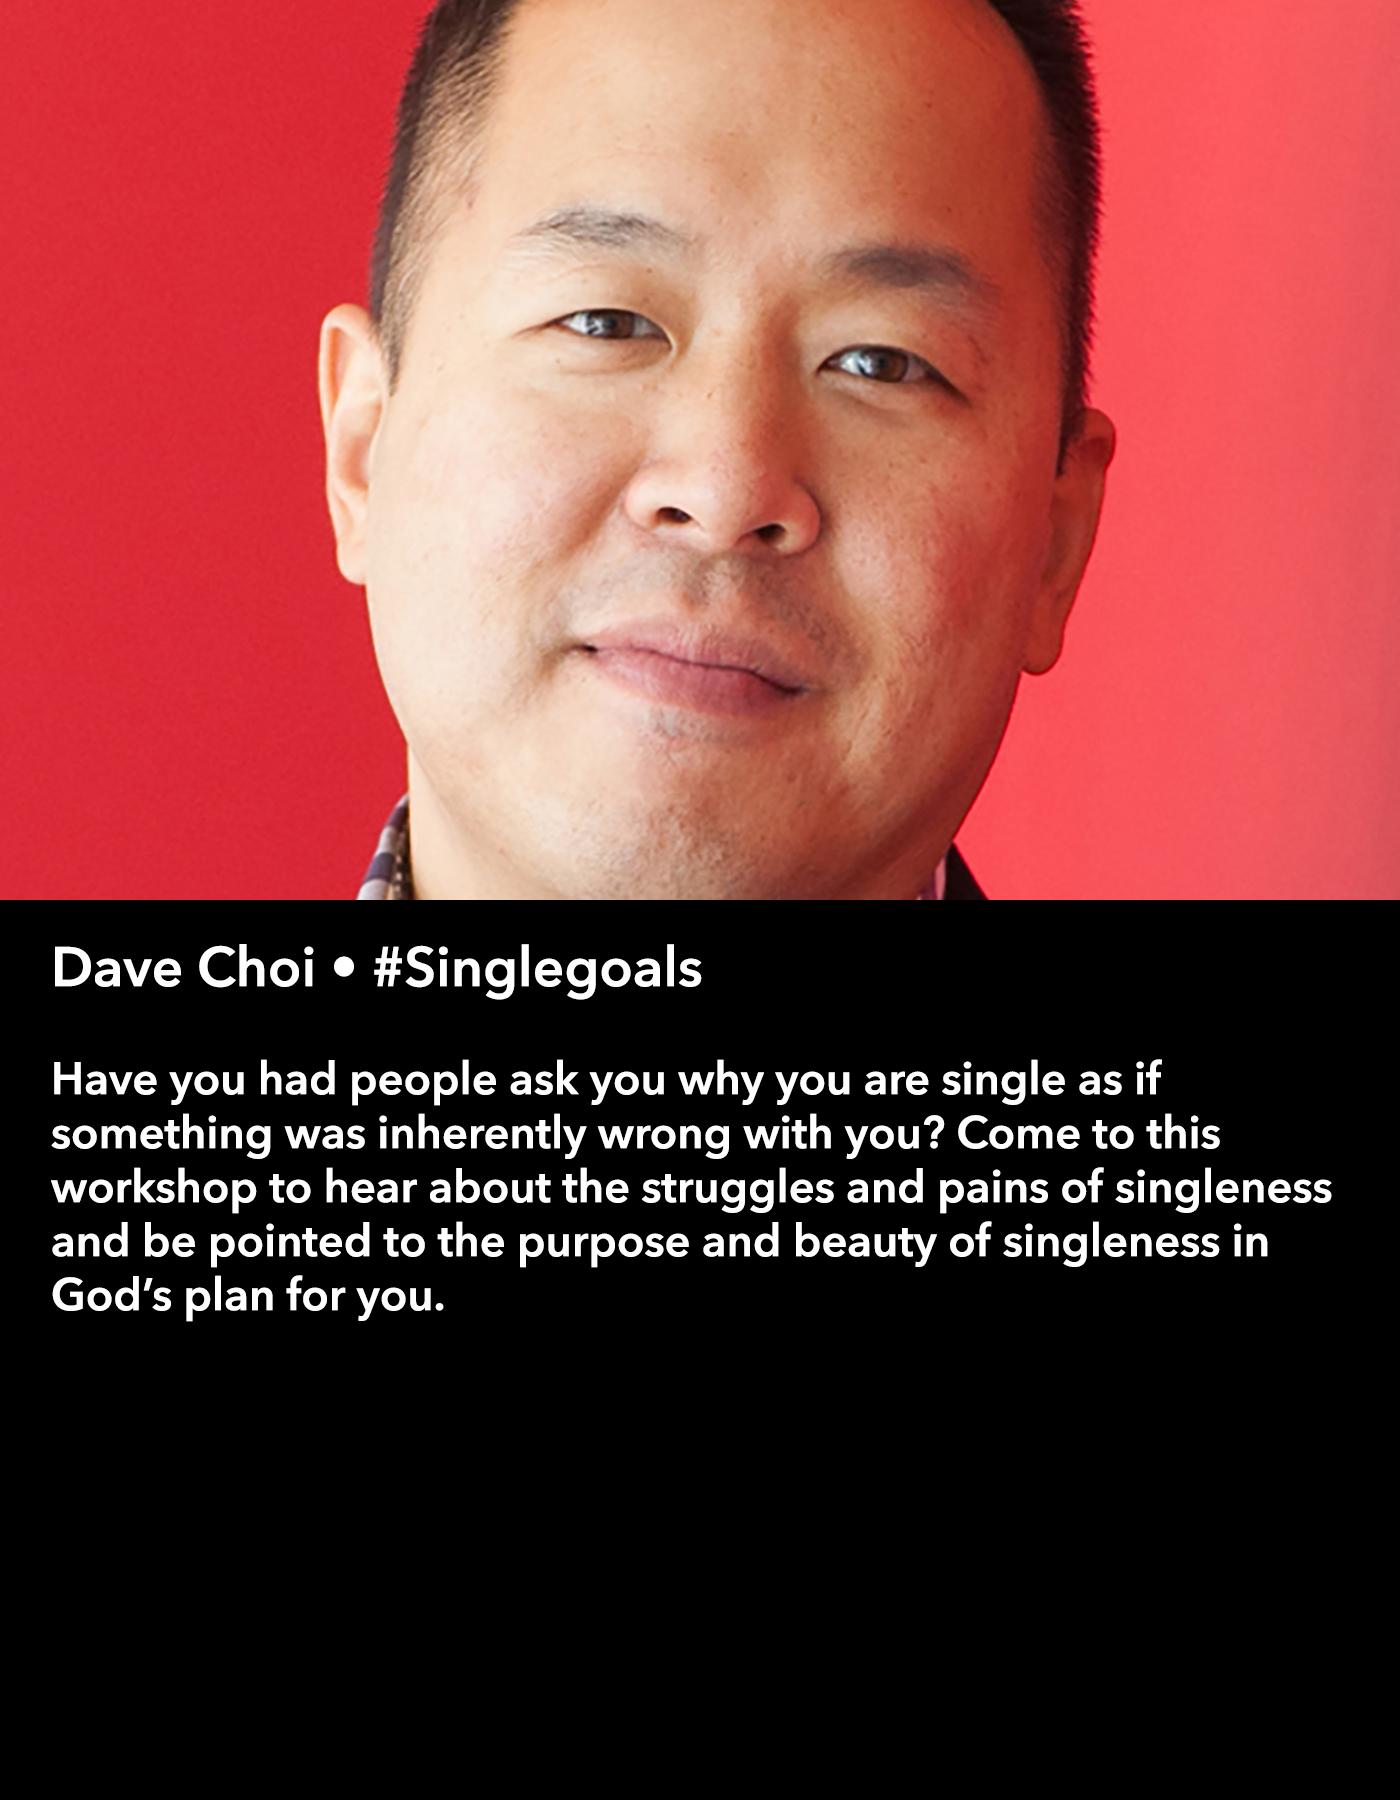 Dave Choi • #Singlegoals • Friday Night, March 17 • 8:30 – 9:45 pm